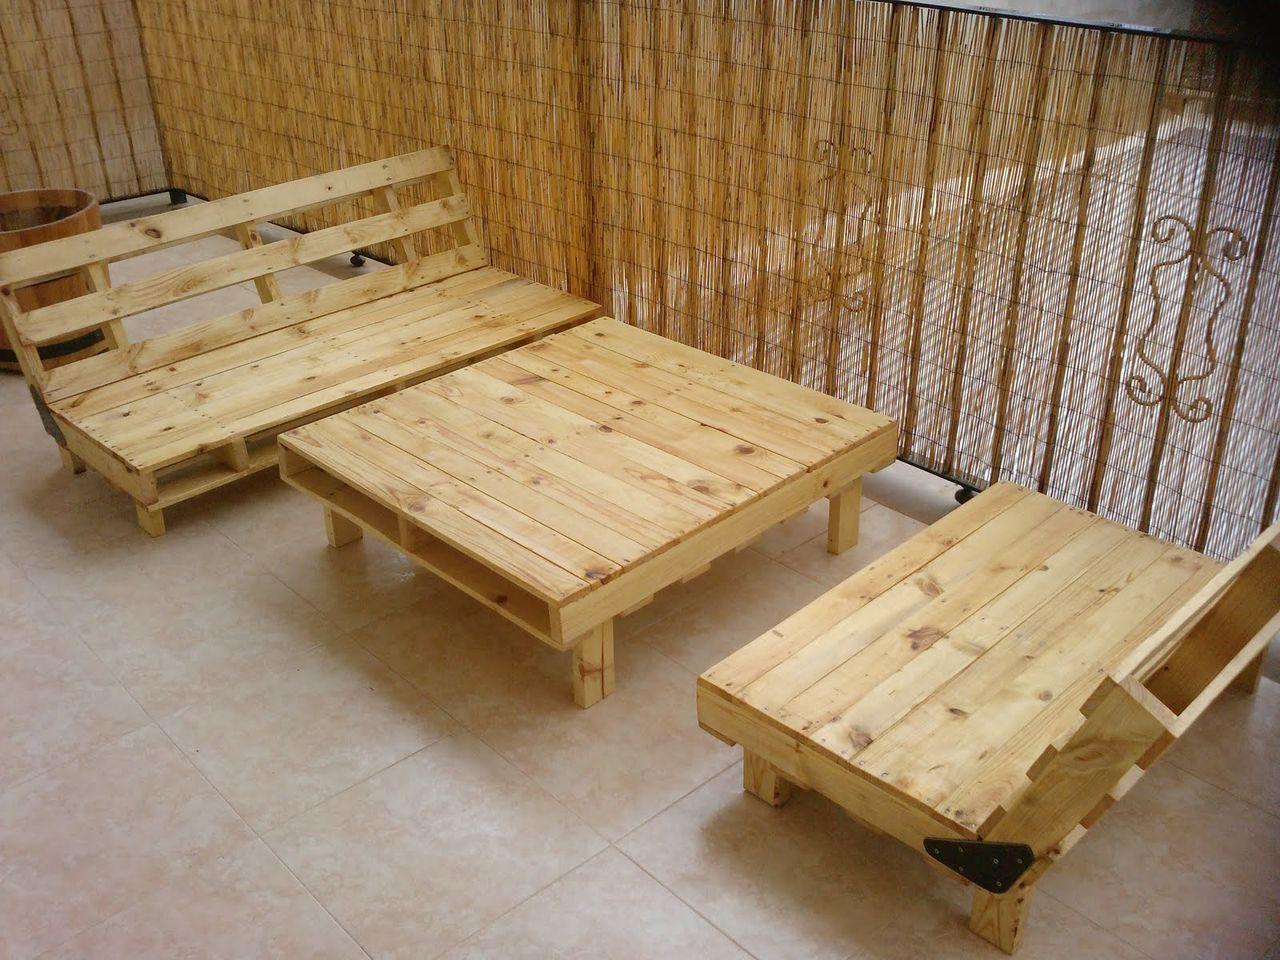 Pin de jeny chiq en muebles de paletas pinterest for Tarimas de madera para muebles